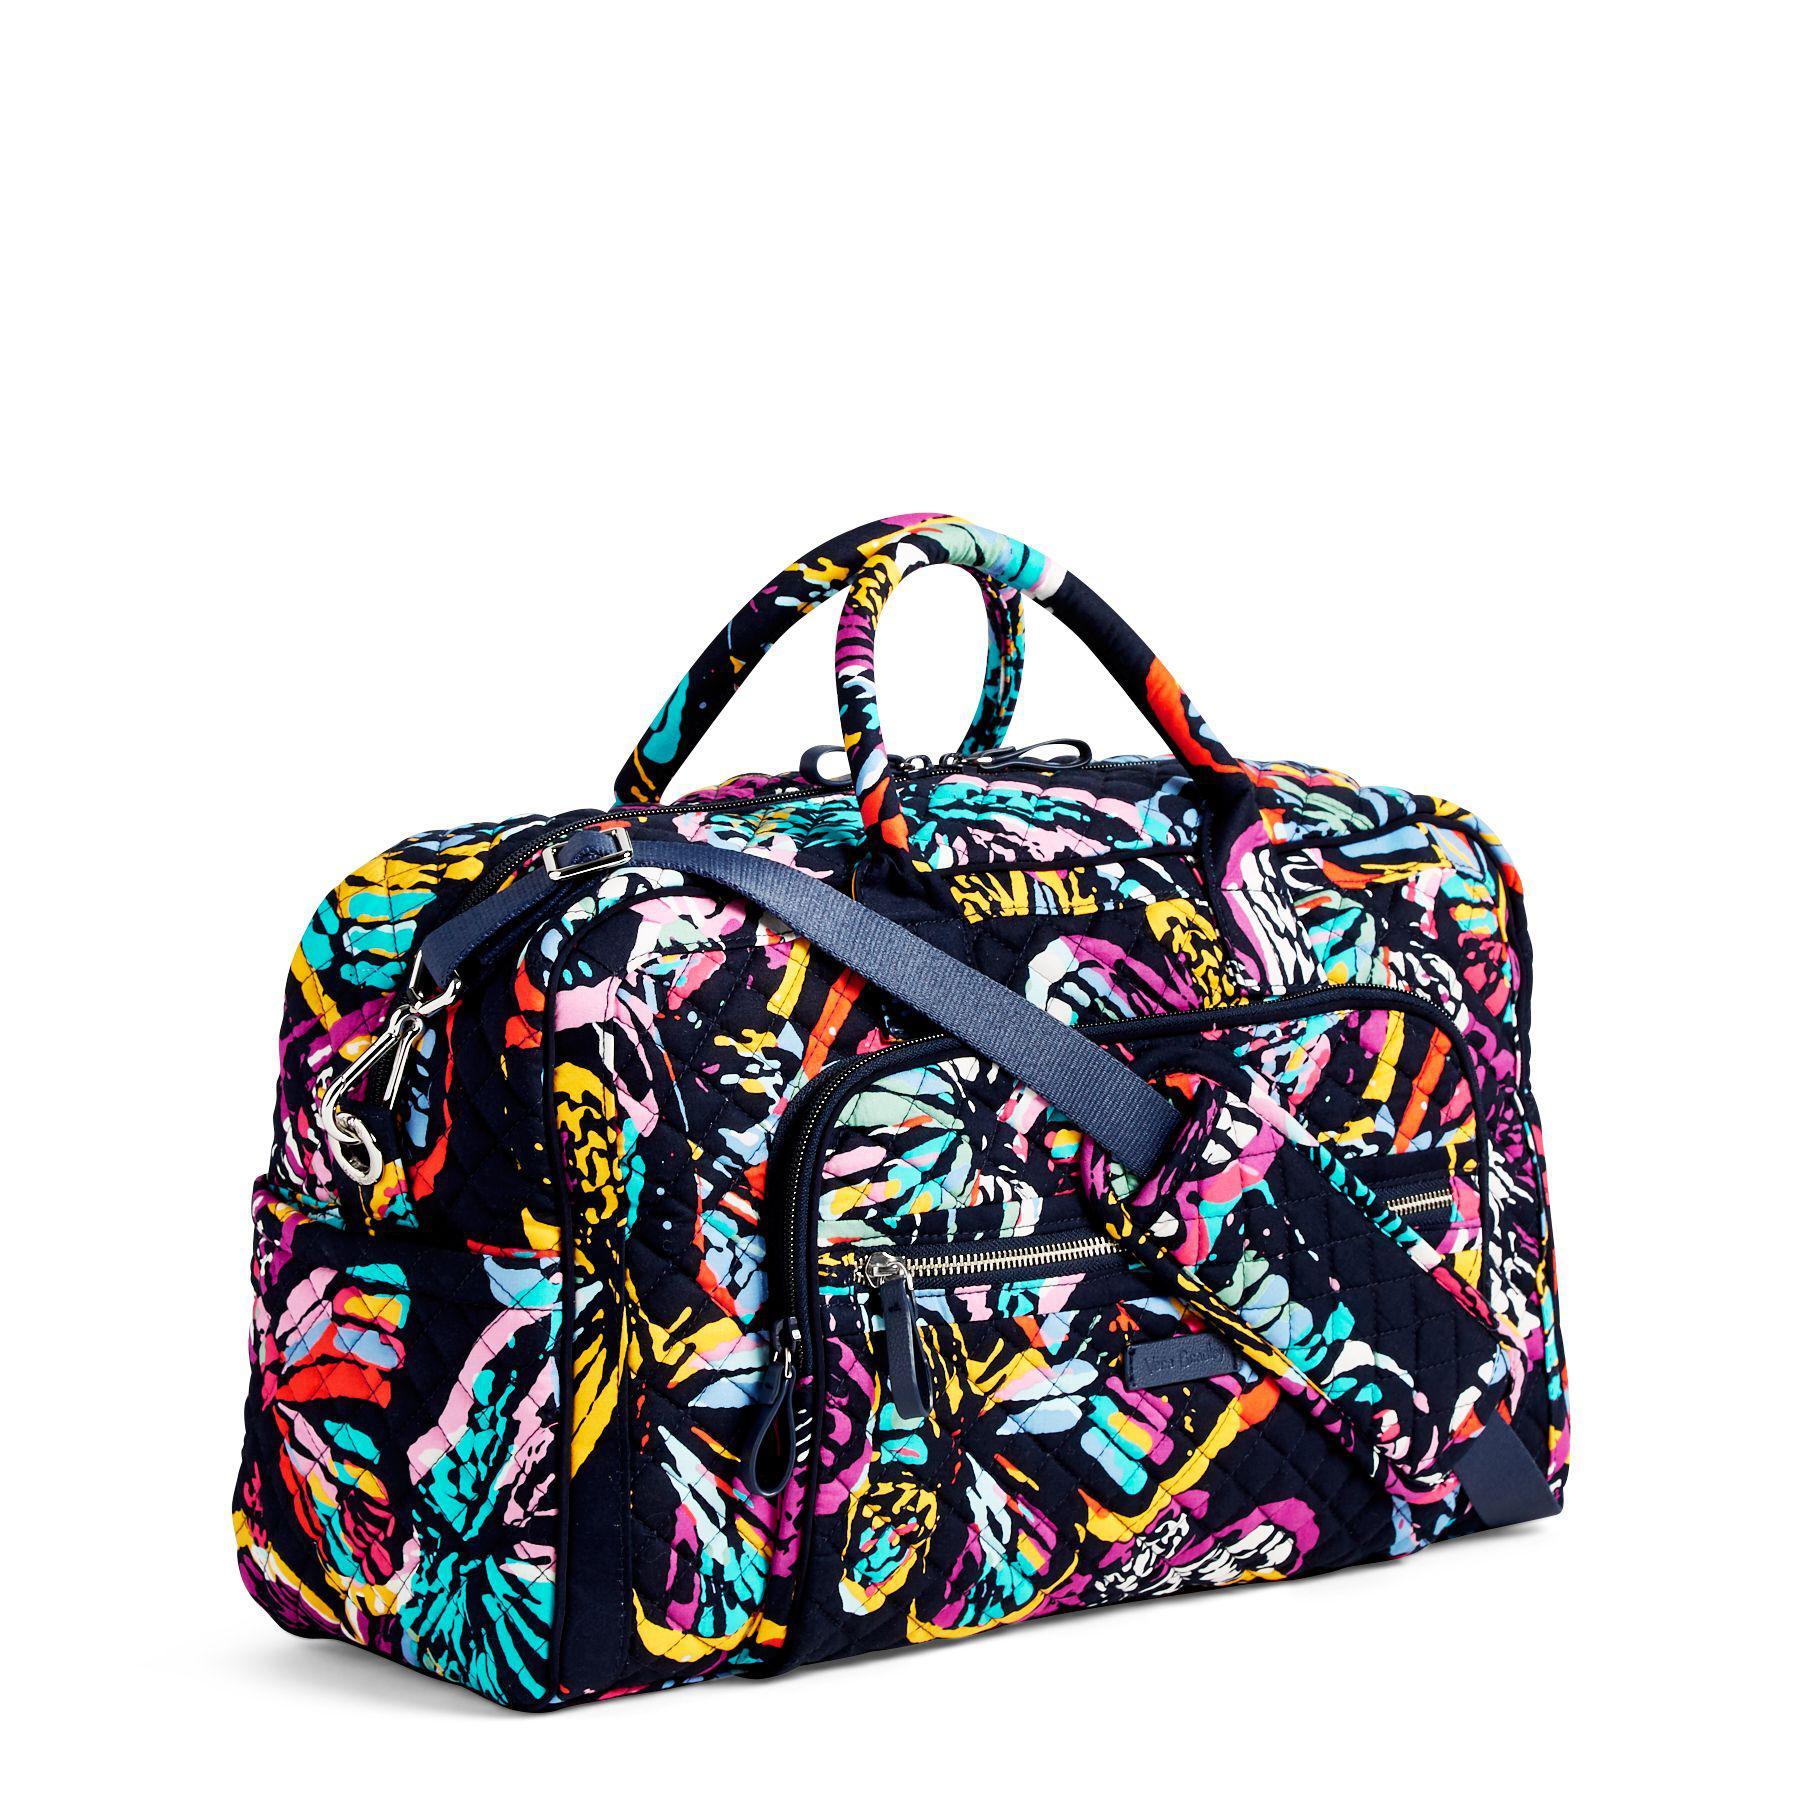 Weekender Travel Bag Vera Bradley  10e4bf594ffe0